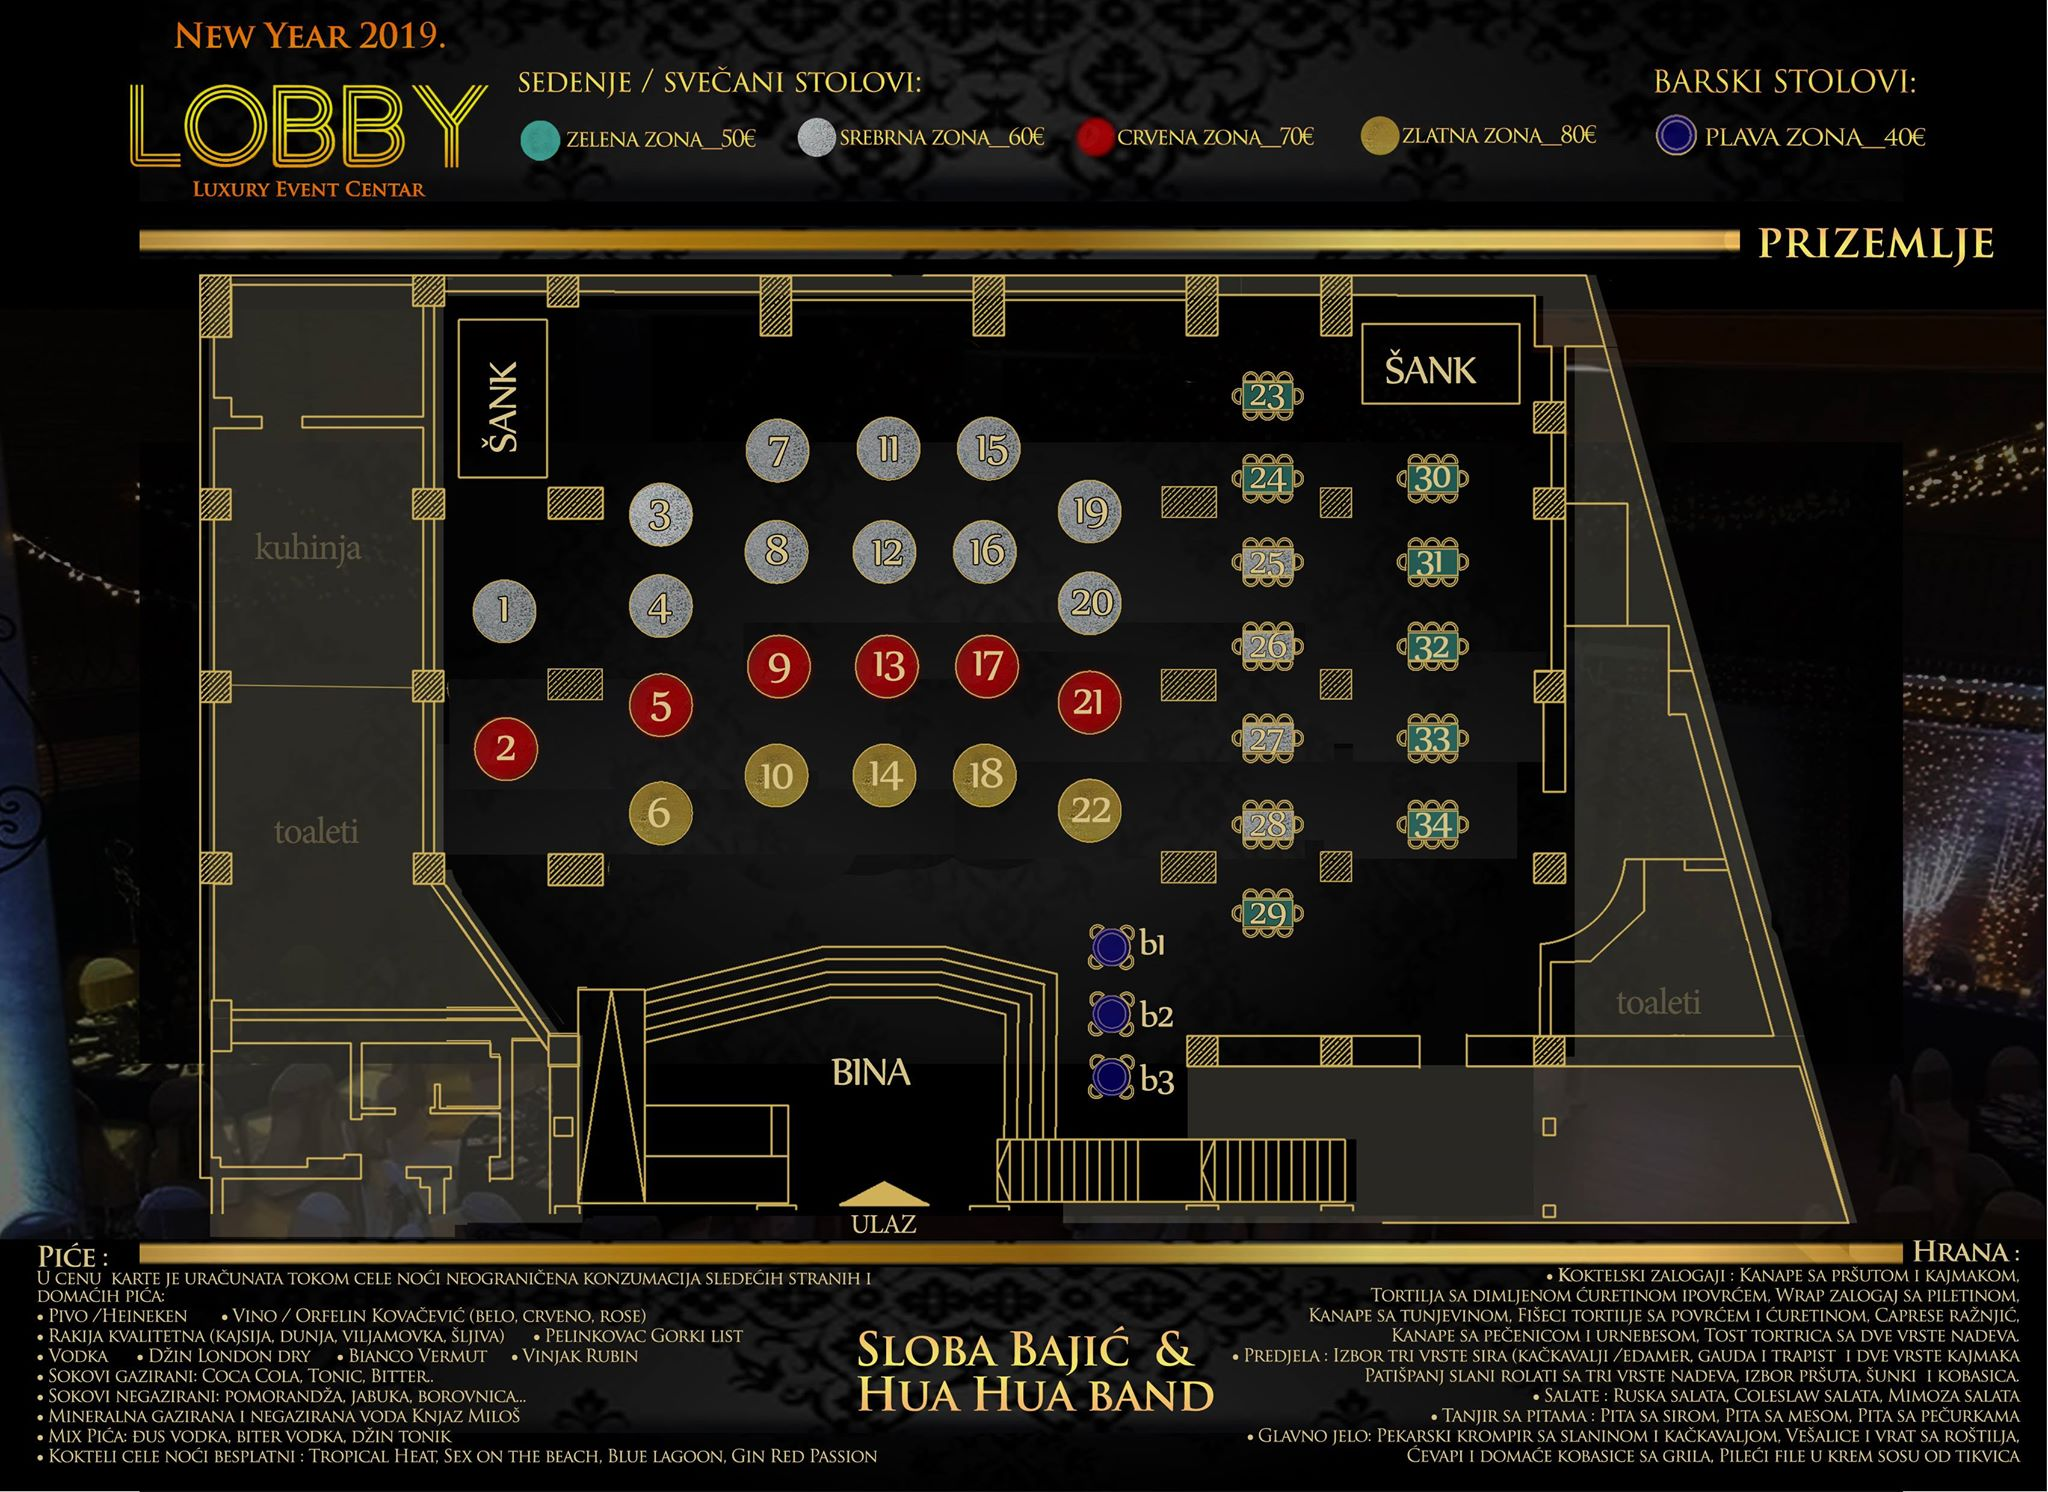 Docek Nove godine Beograd 2019 Lobby Event Center